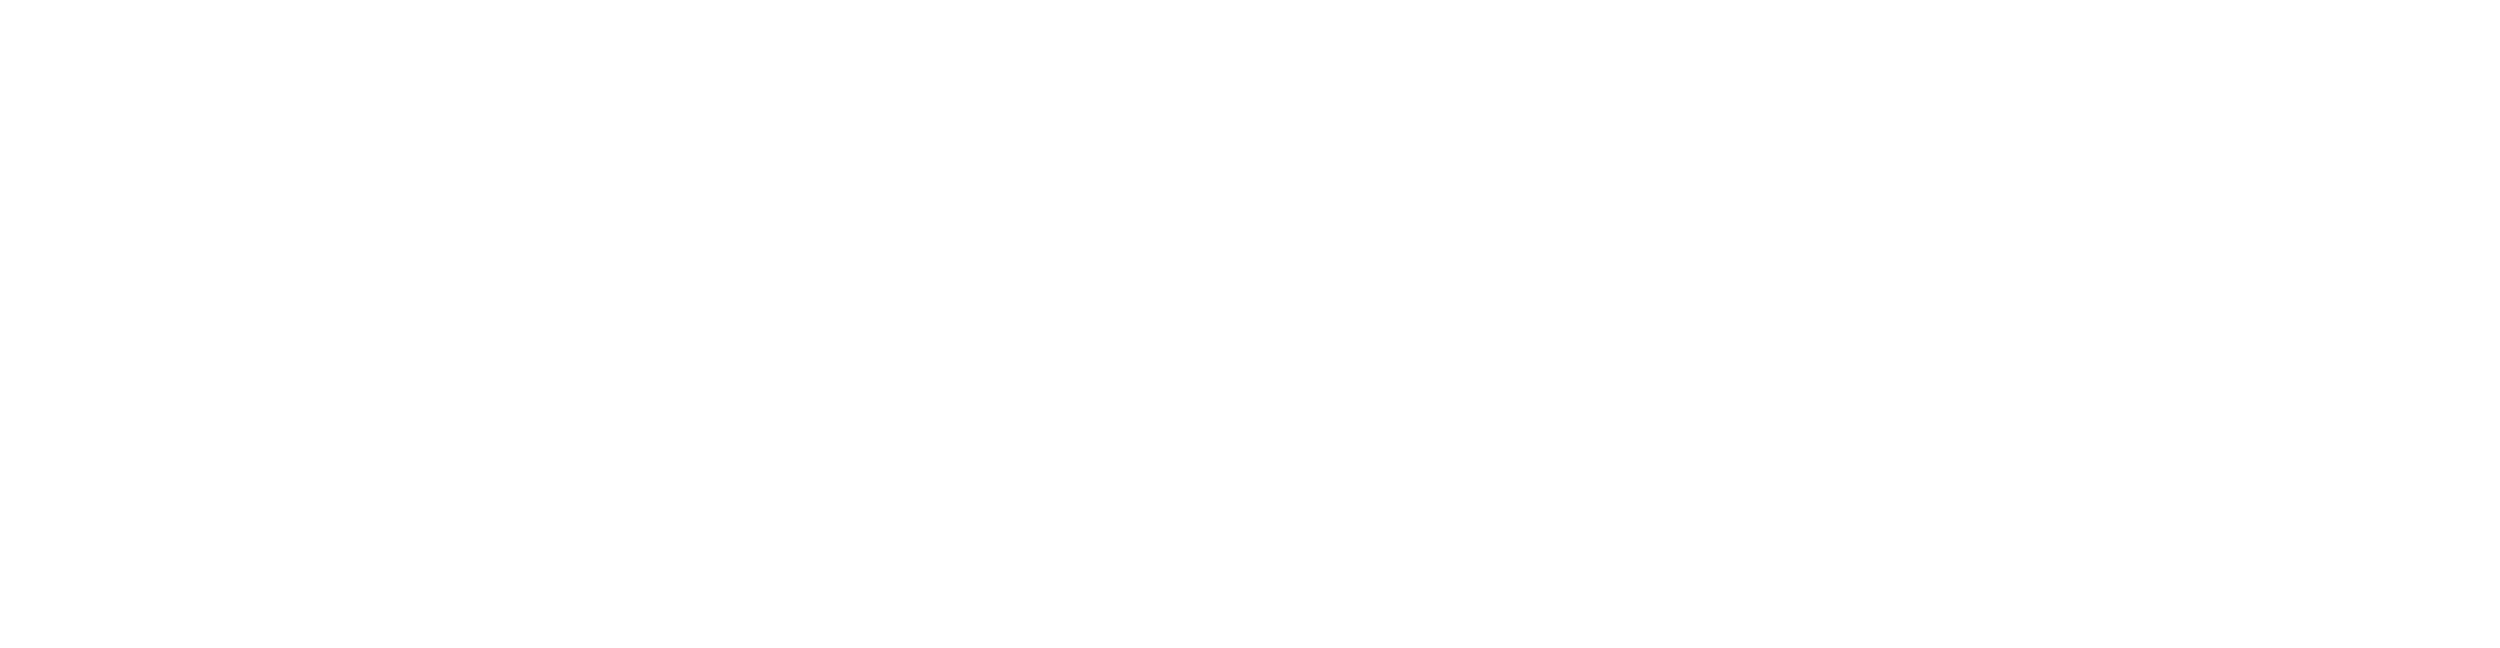 O2NoseFilters-Logo-White-Long.png